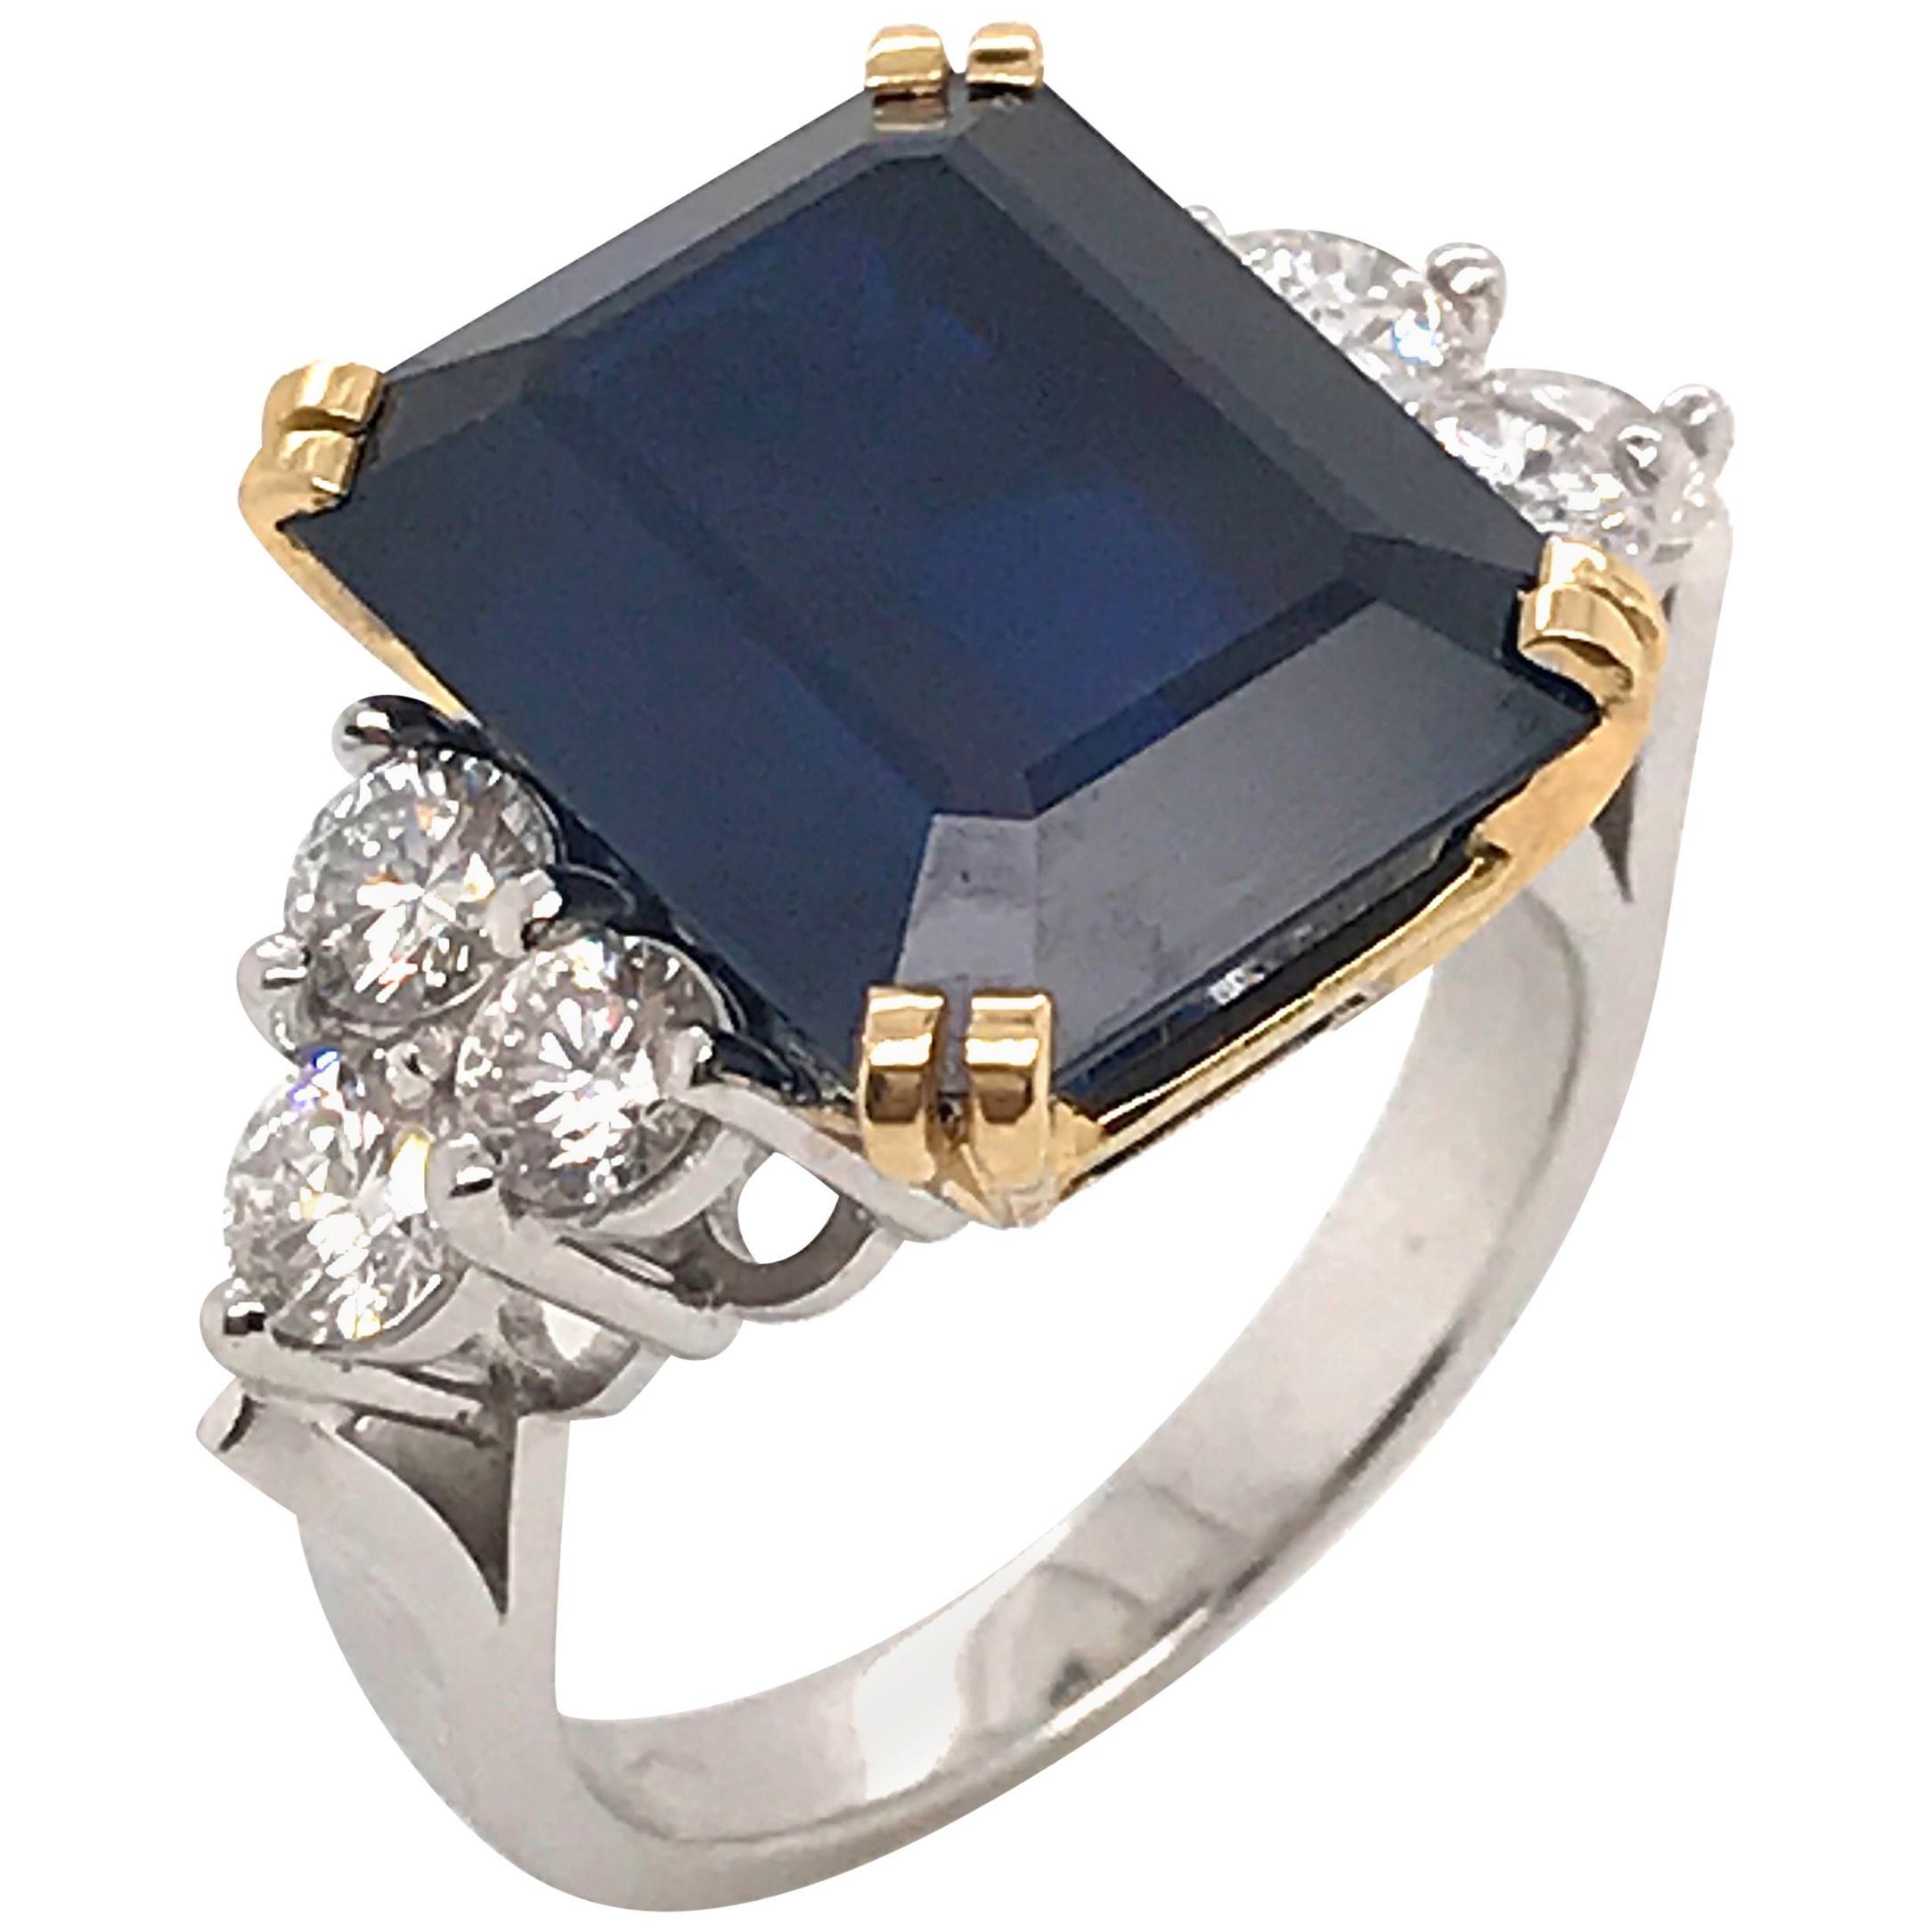 Ceylon Sapphire Diamonds Emerald Size White and Yellow Gold Ring